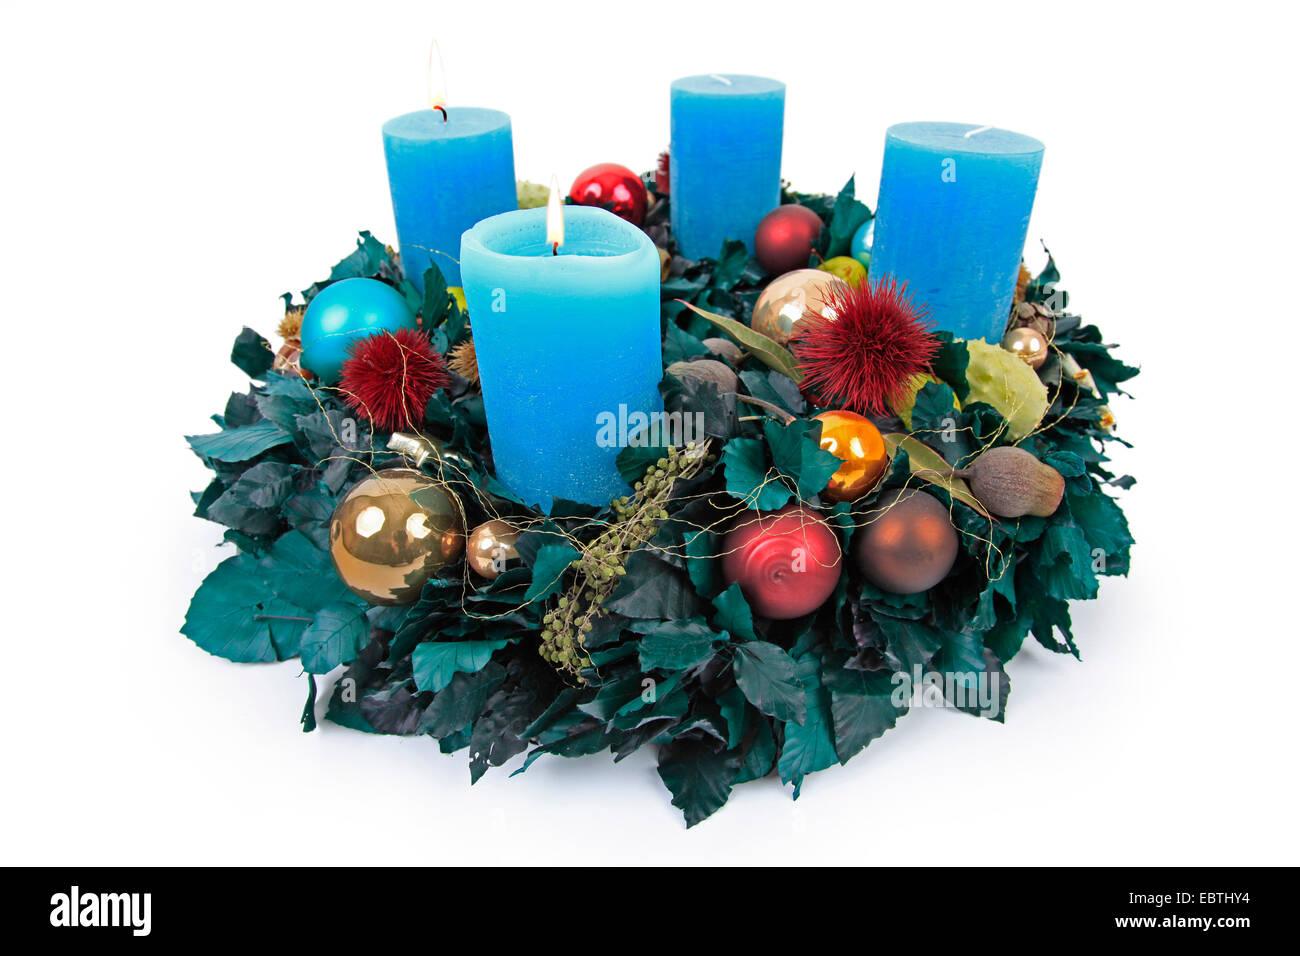 bunten adventskranz mit blauen kerzen stockfoto bild. Black Bedroom Furniture Sets. Home Design Ideas